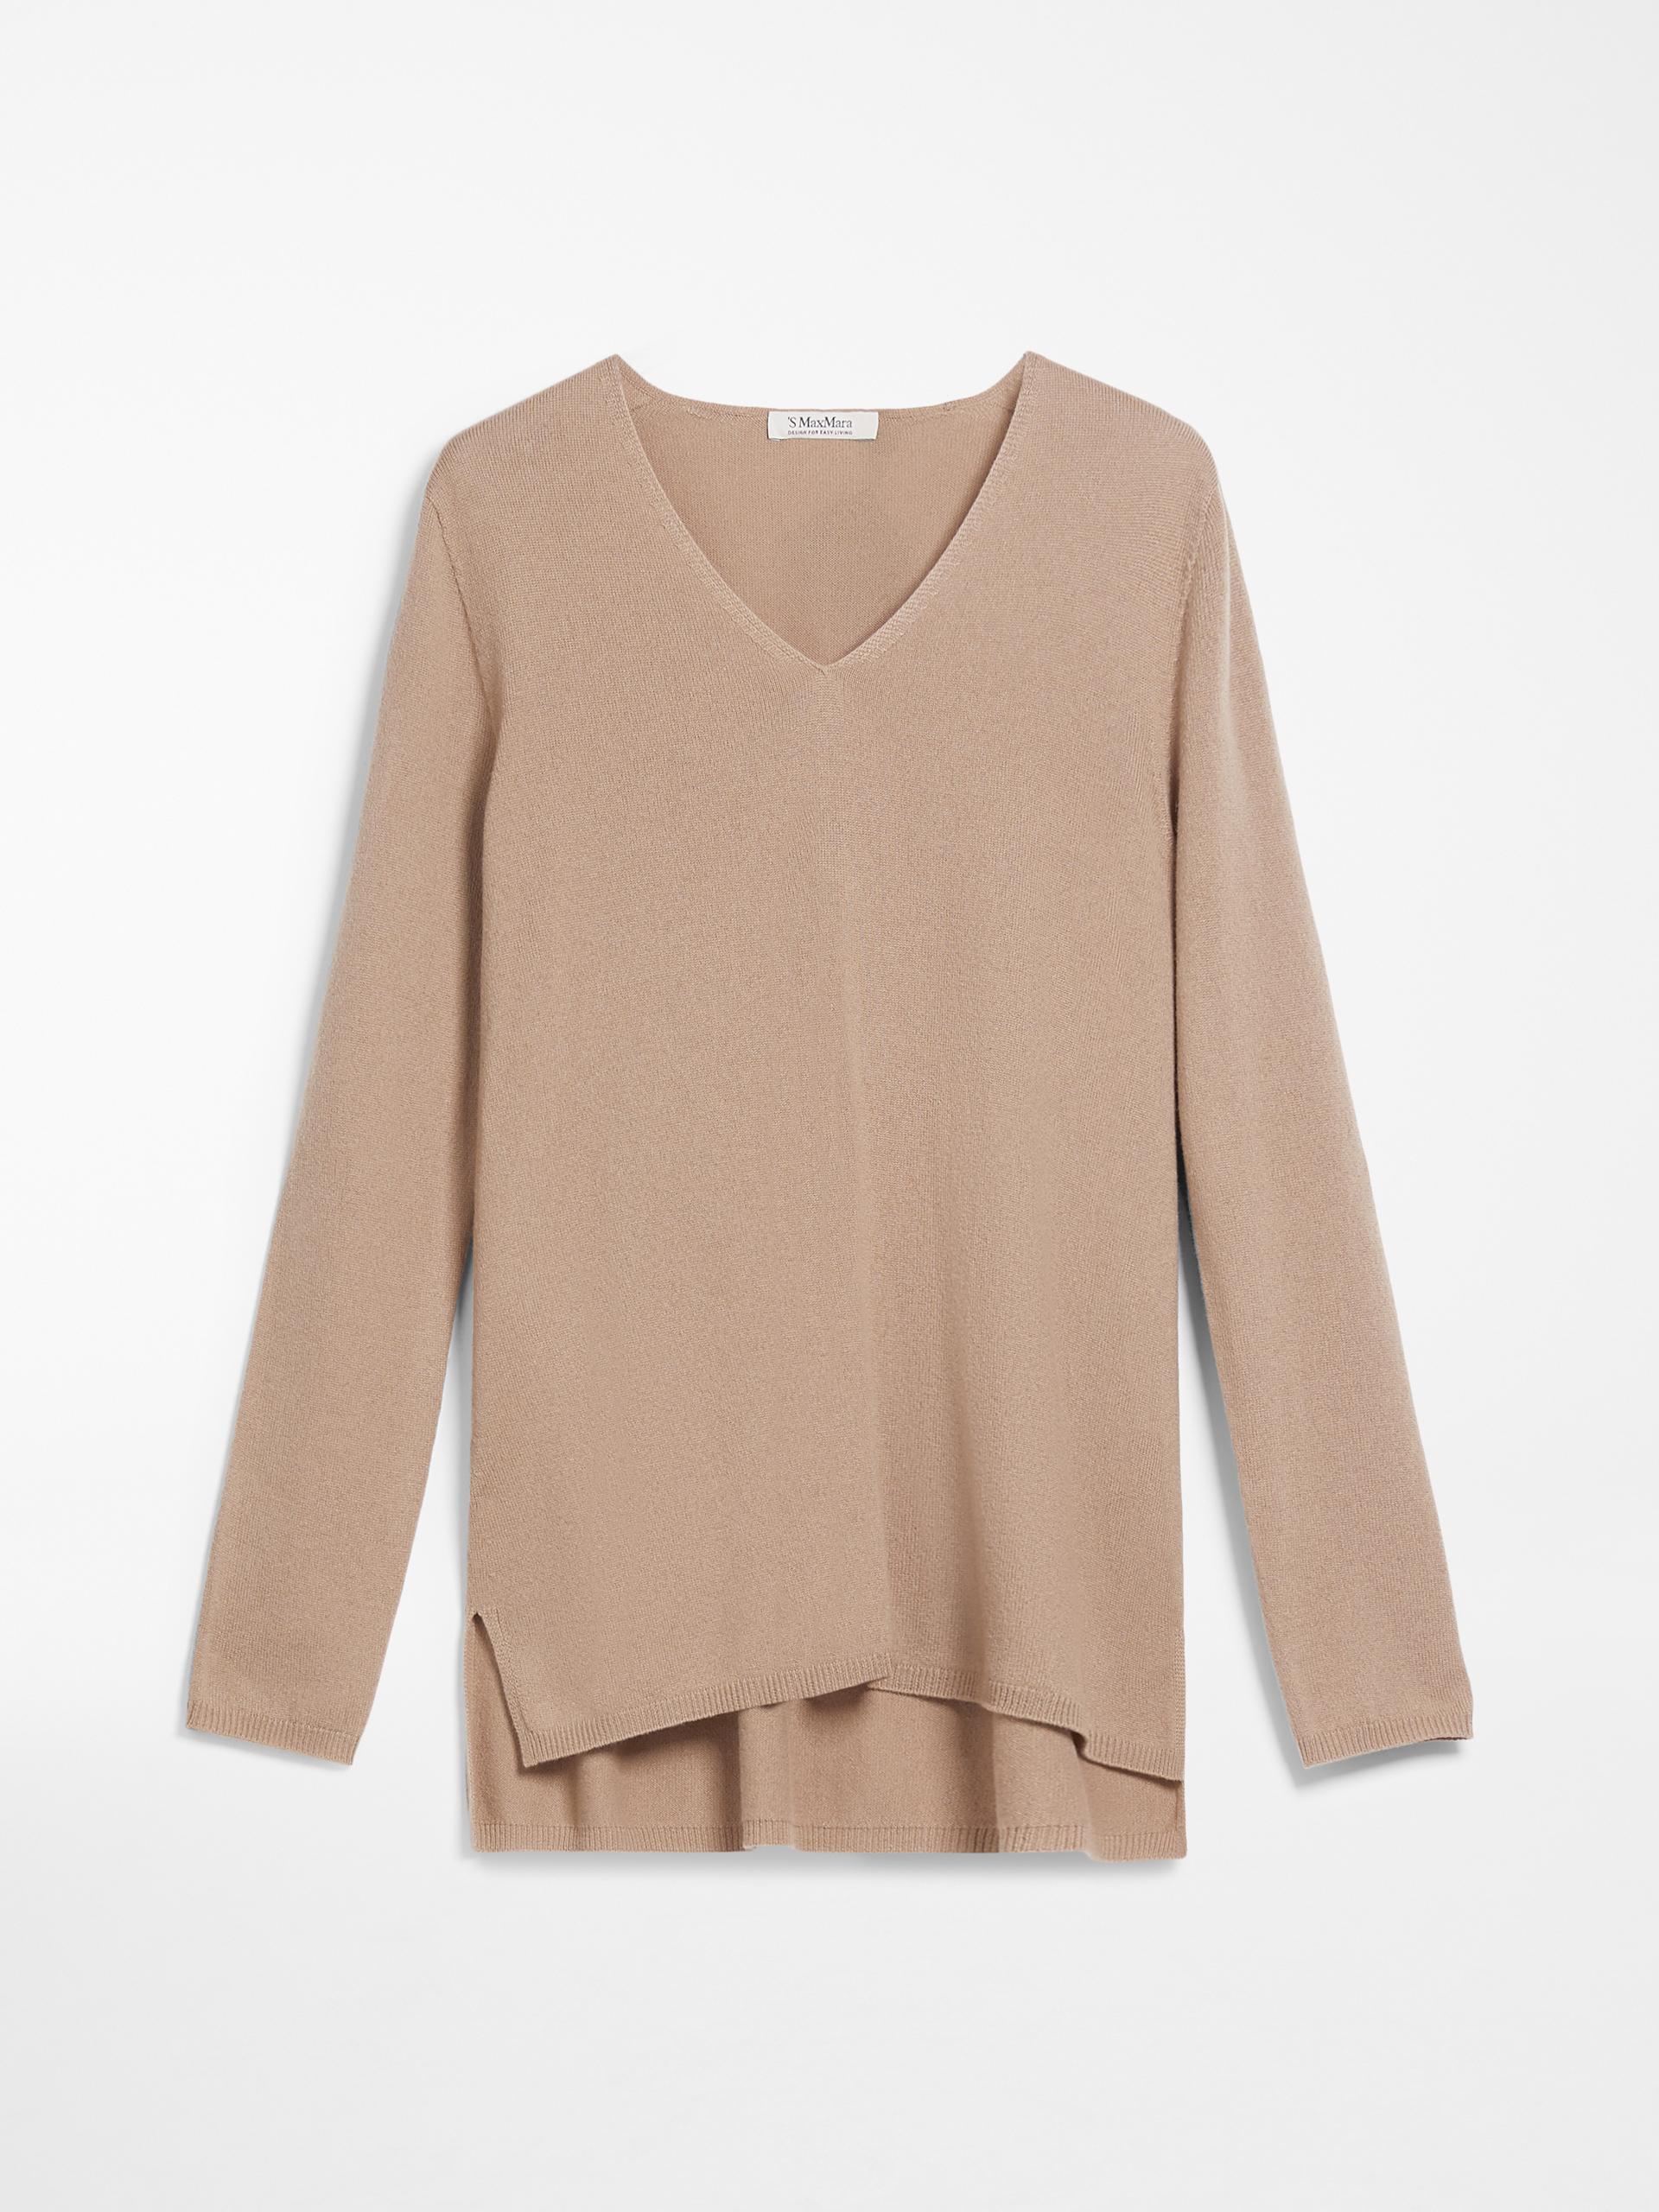 5a047b5b9d2d4 Cashmere yarn jumper, camel -